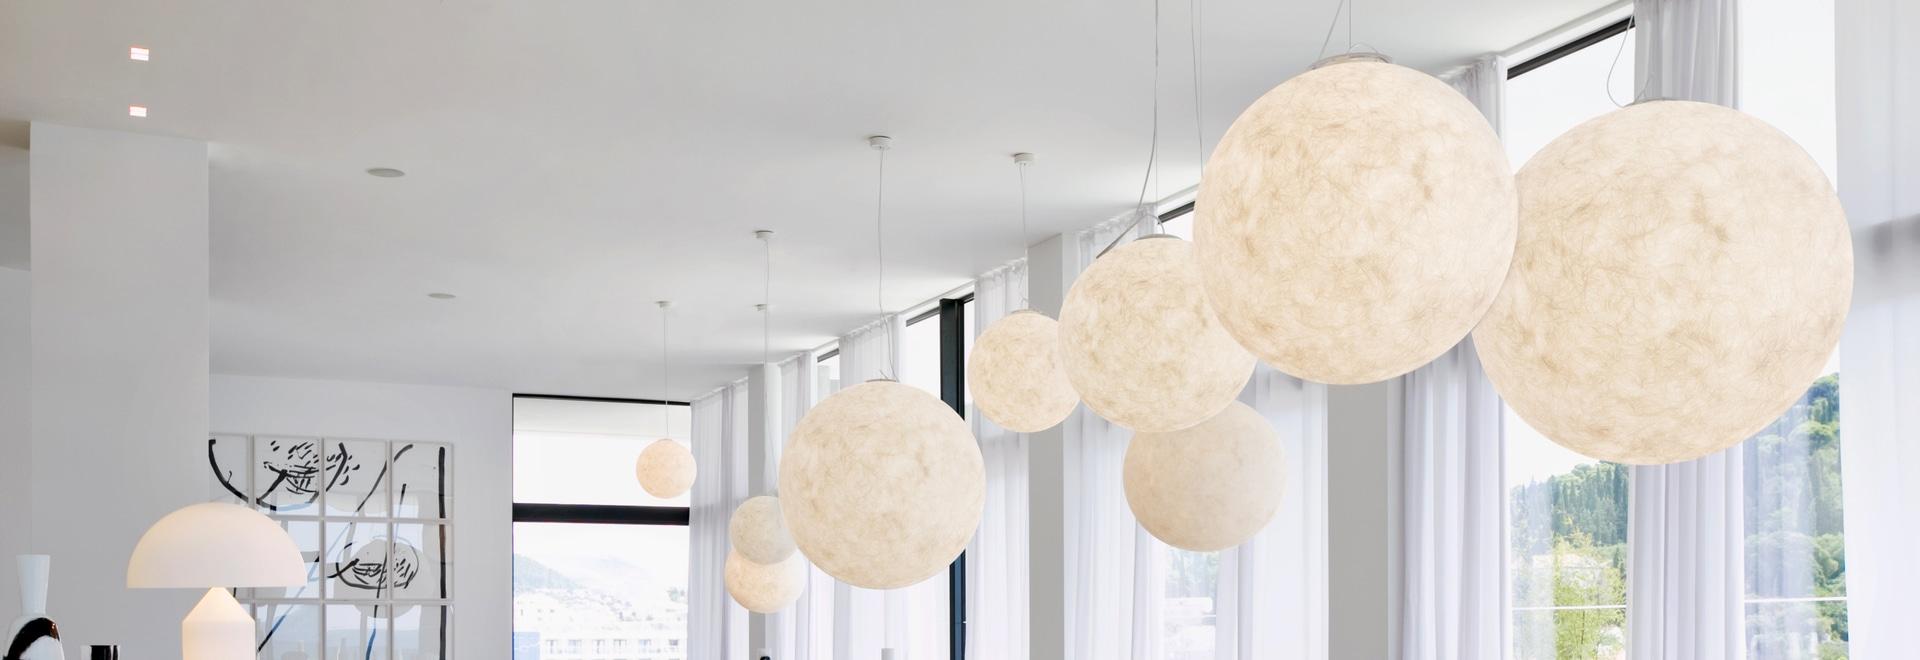 In-es.artdesign's Luna (moon)